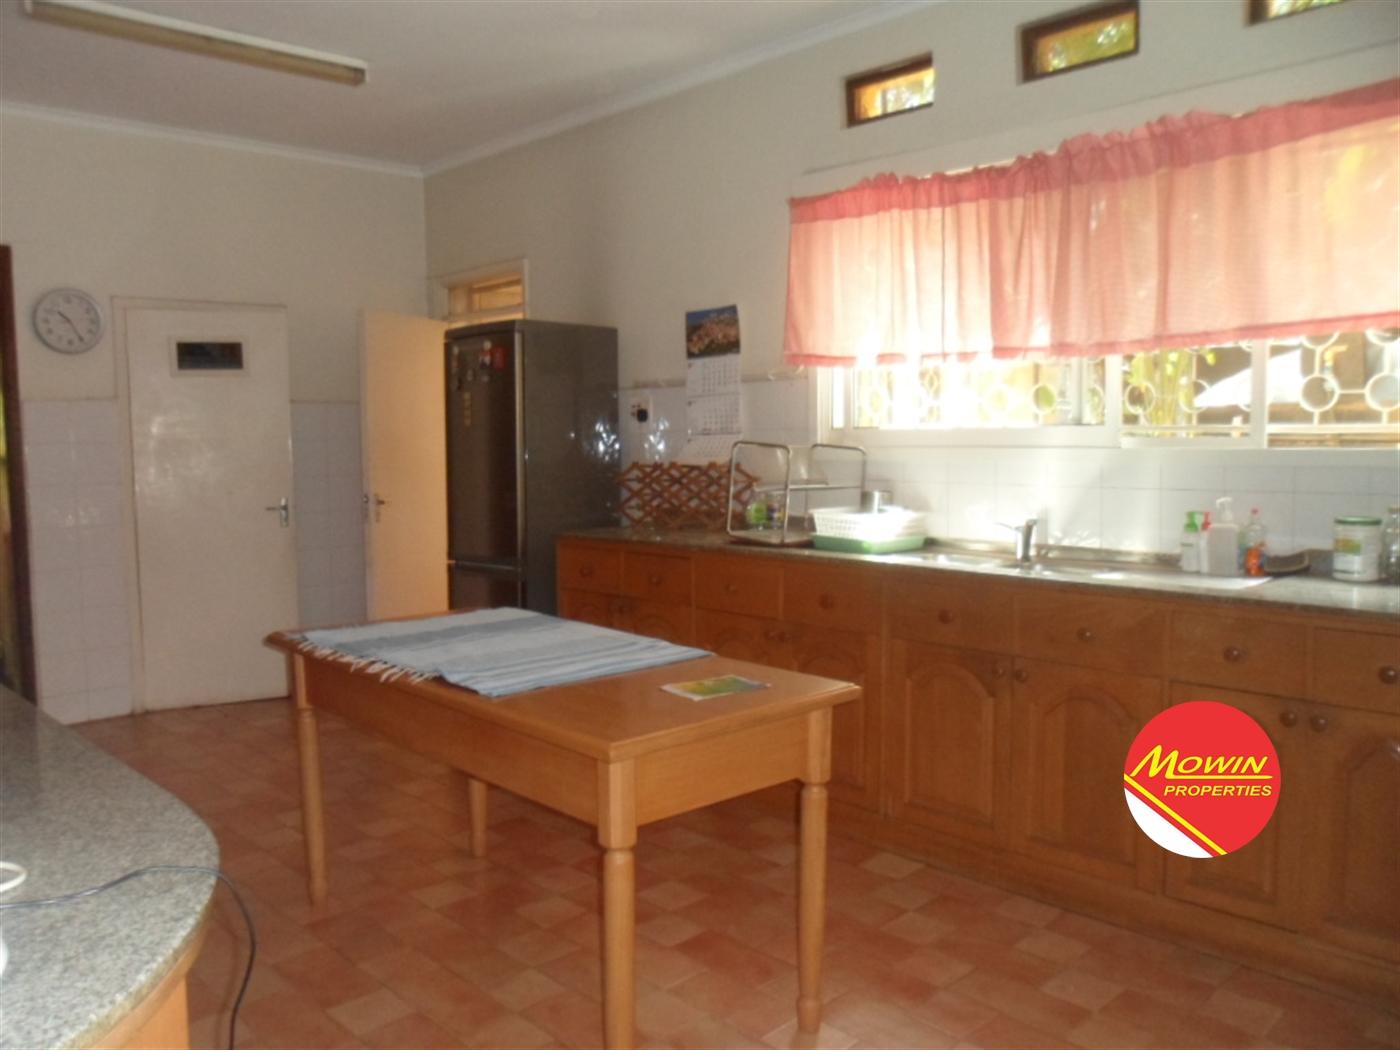 Storeyed house for sale in Bugolobi Kampala